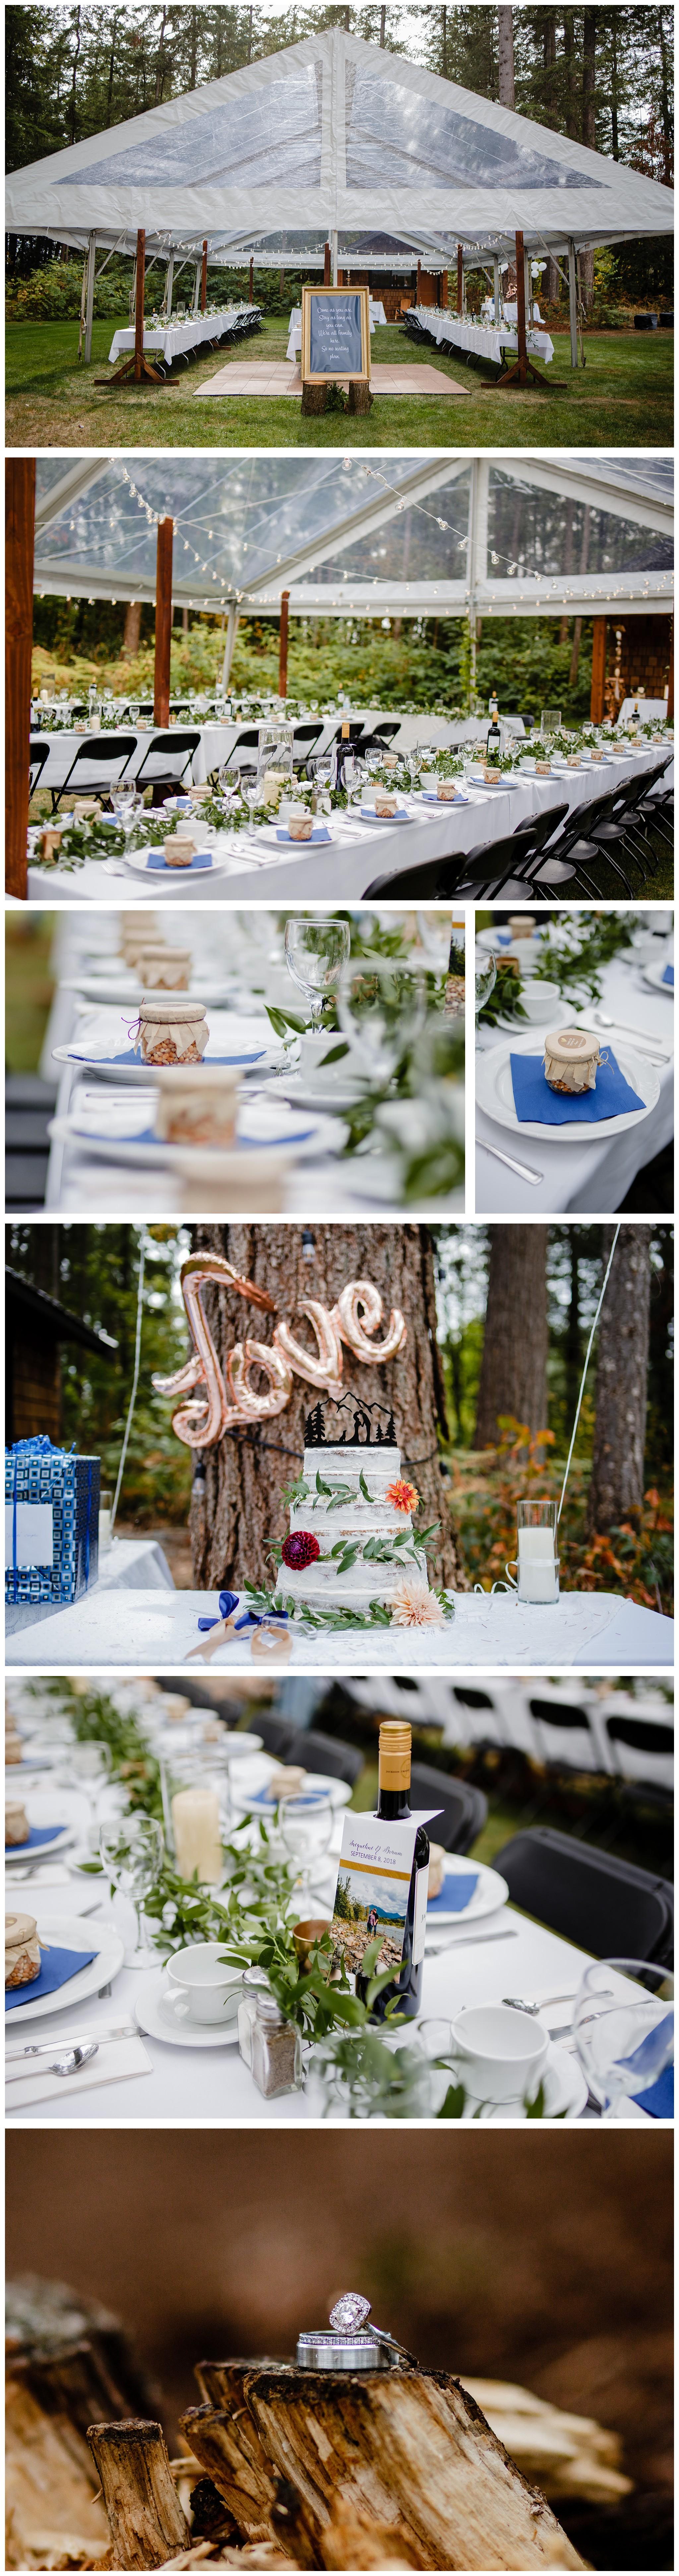 Aldergrove Park Fall Backyard Wedding Photographer Pregnant Bride Tent Outdoor BC Canada Best Wedding Photographer_0043.jpg